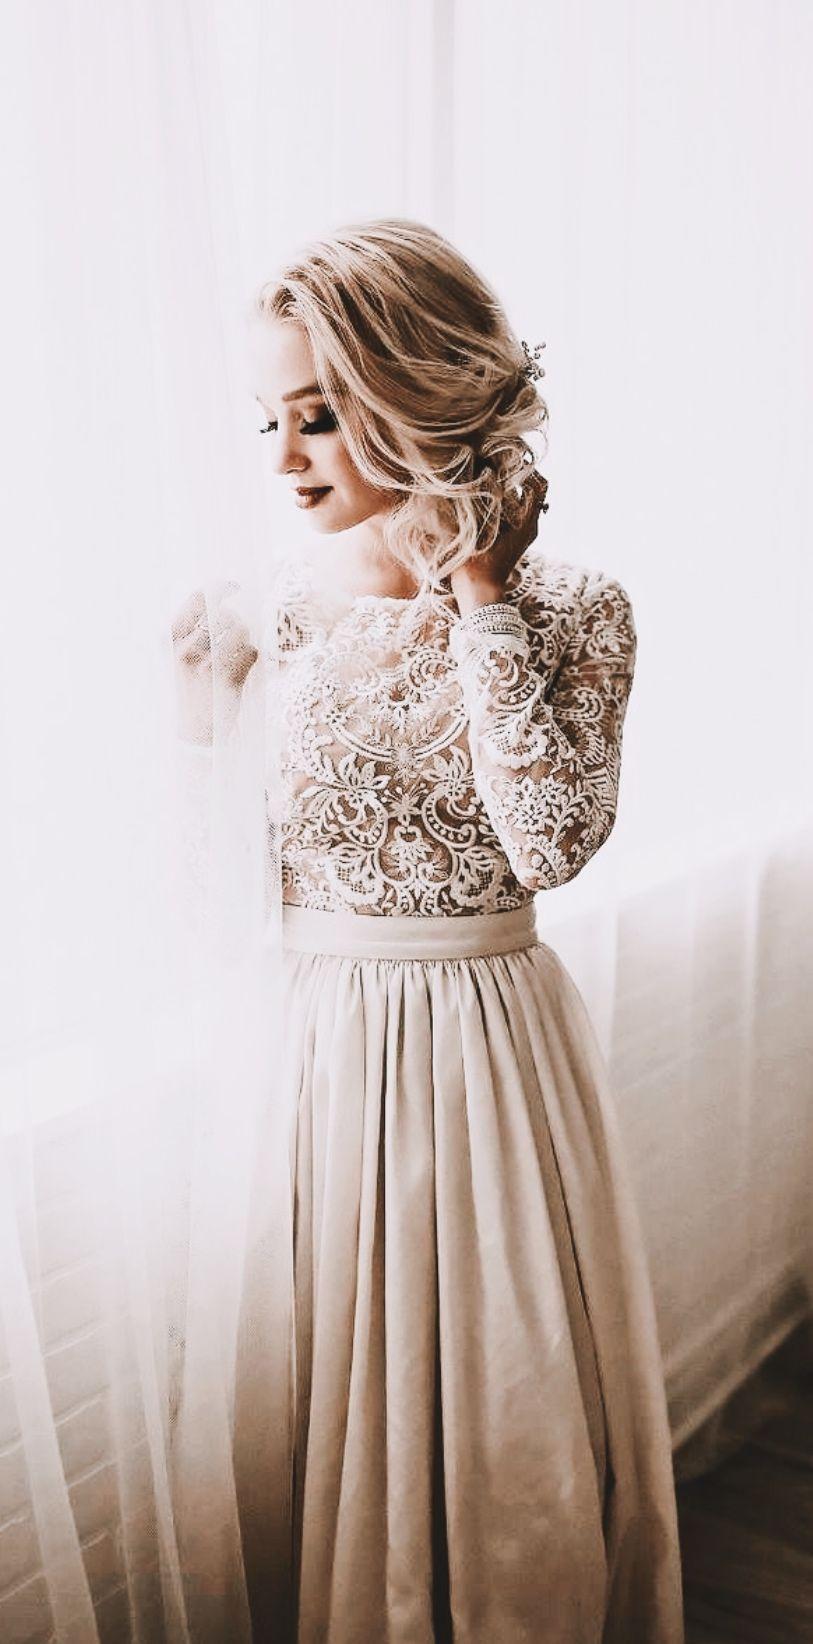 P I N T E R E S T Calliegracec Vintage Wedding Dress 1920s Wedding Dress Guide 1920s Wedding Dress